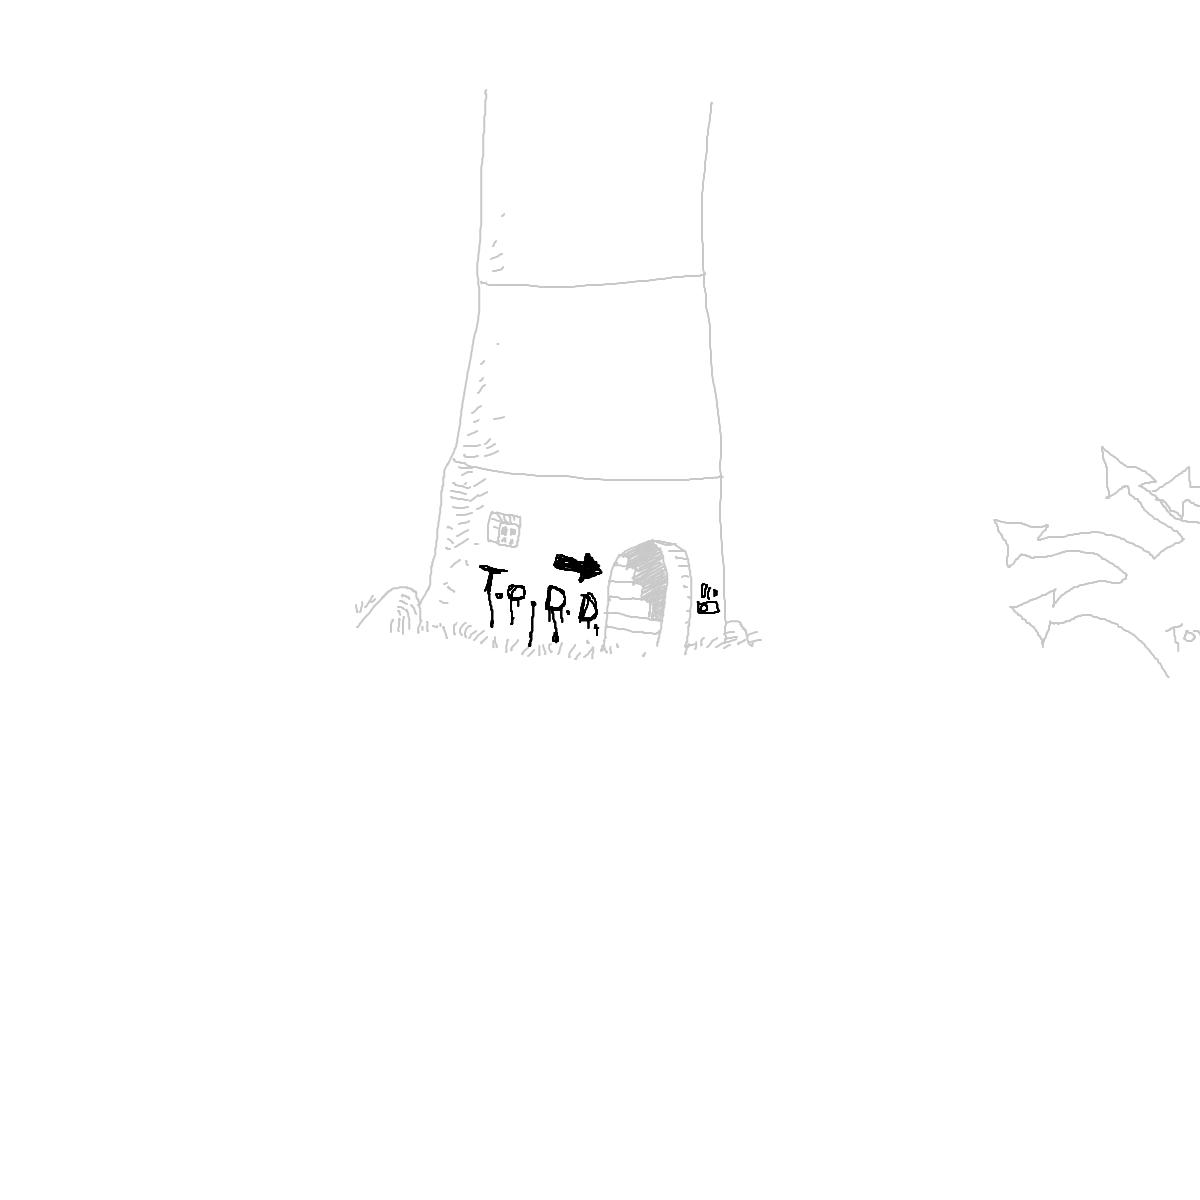 BAAAM drawing#22135 lat:78.4192276000976600lng: -4.4740548133850100